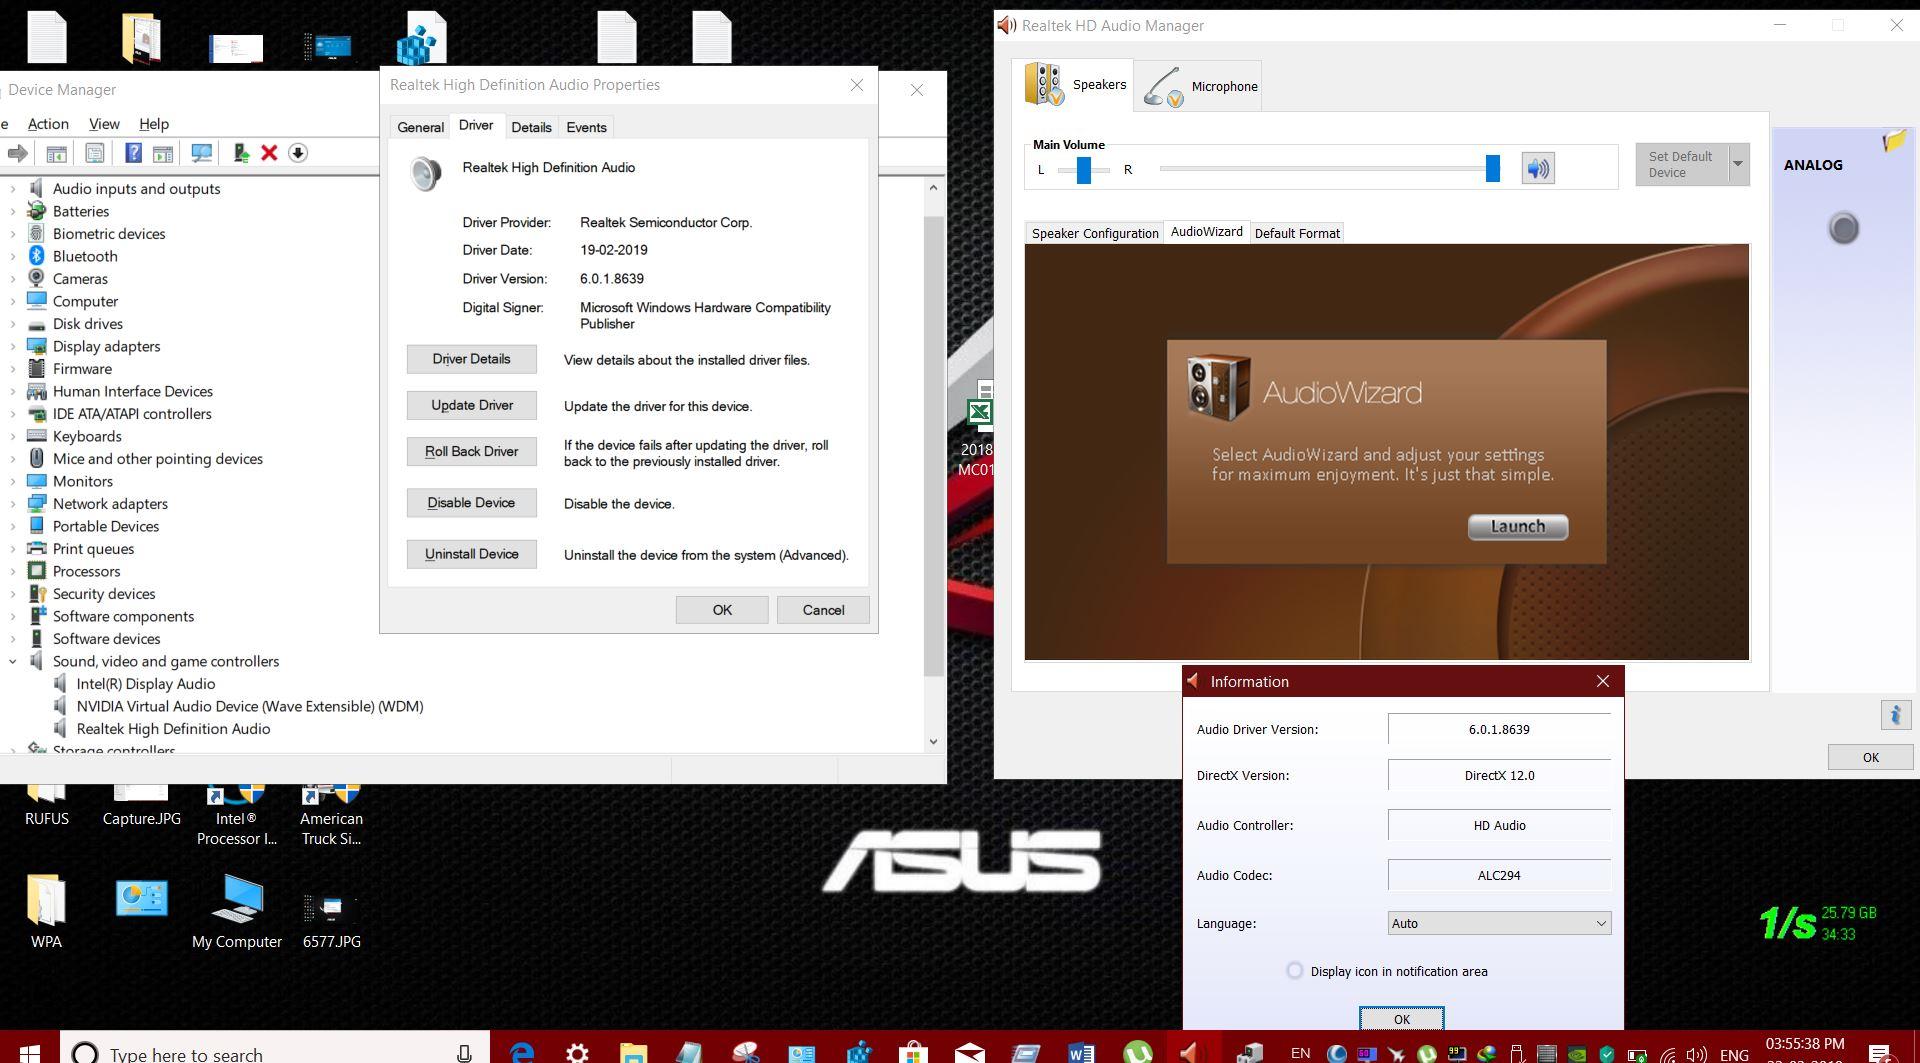 realtek hd audio manager windows 7 32 bit update